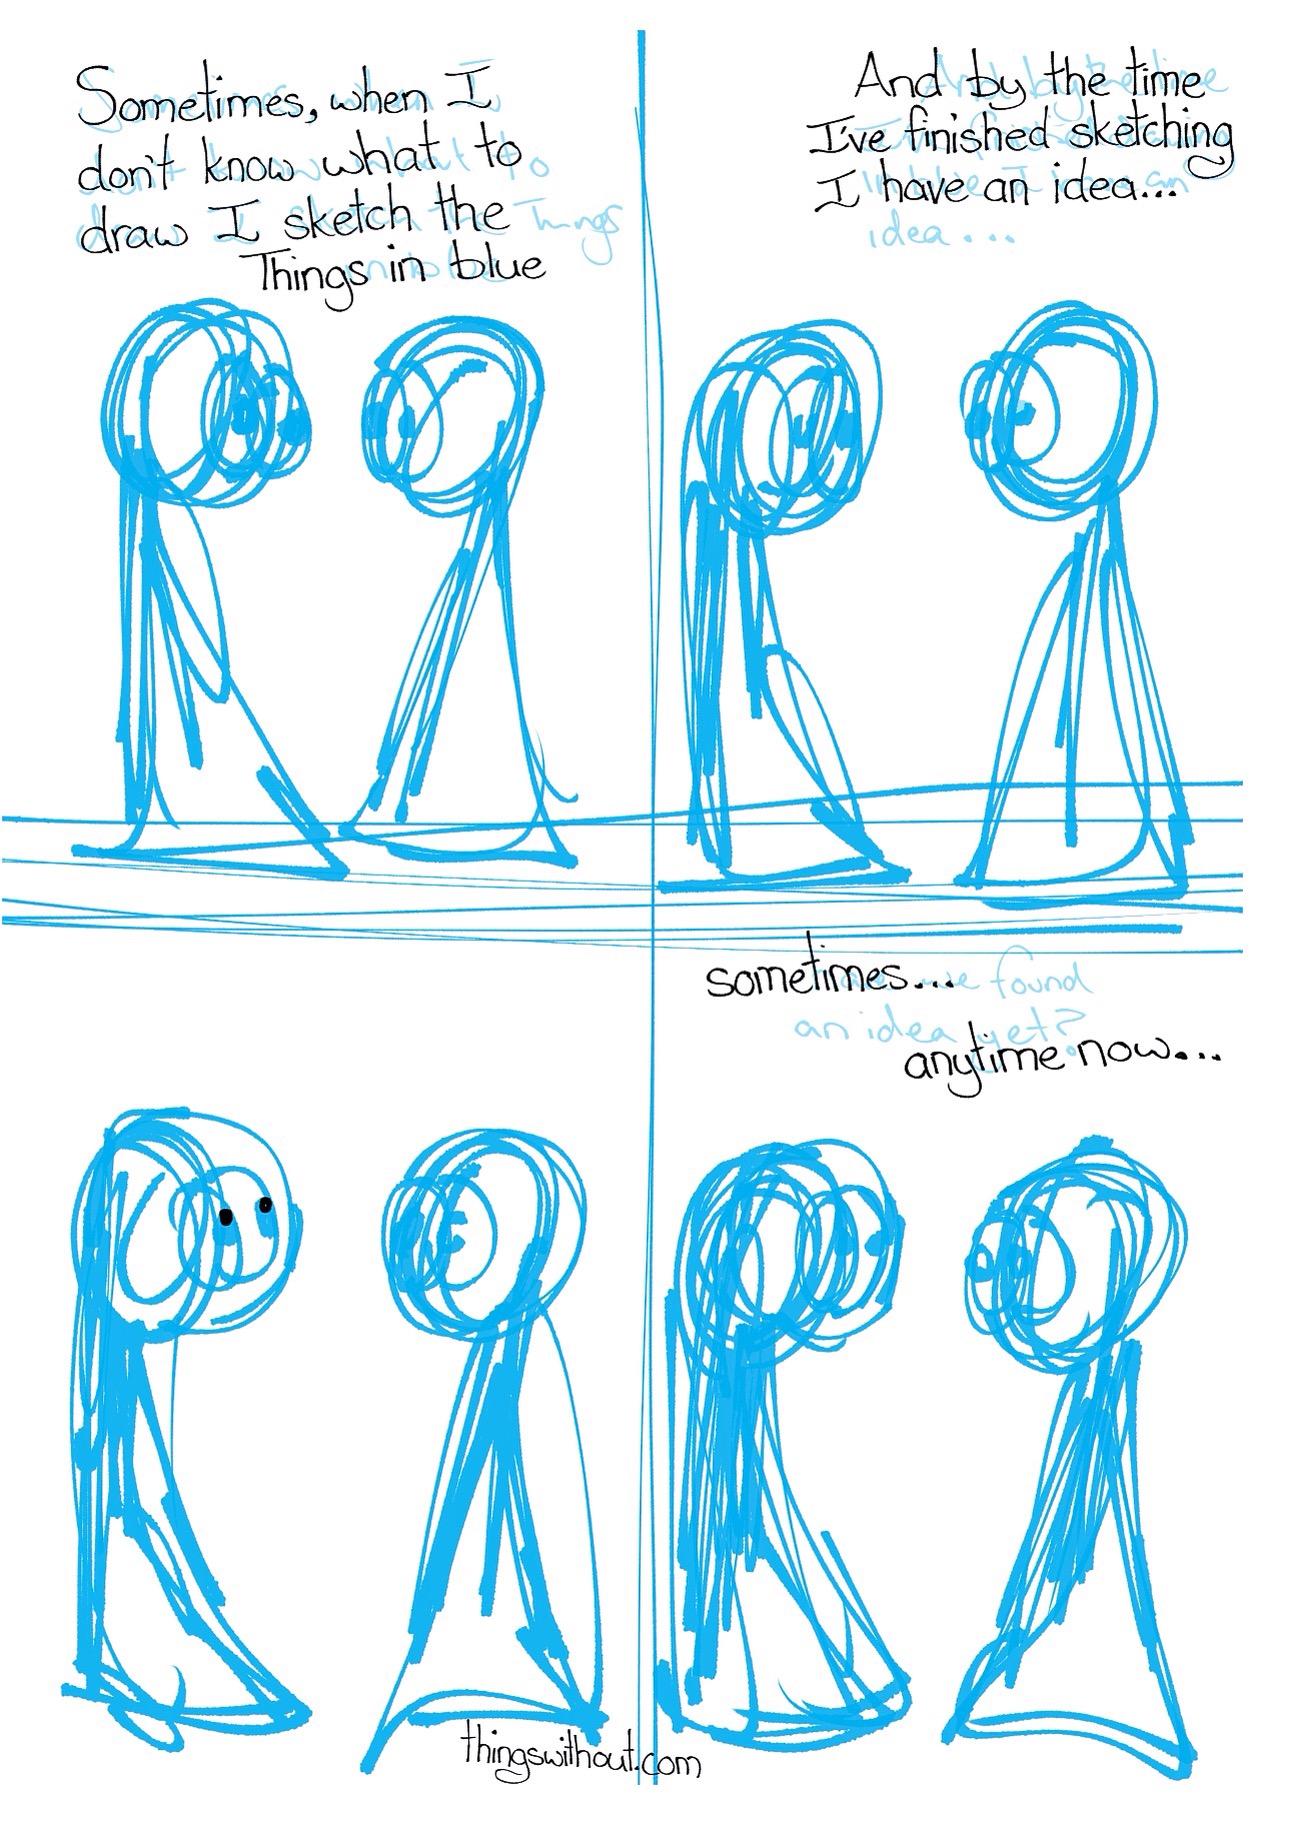 497: sketch in blue